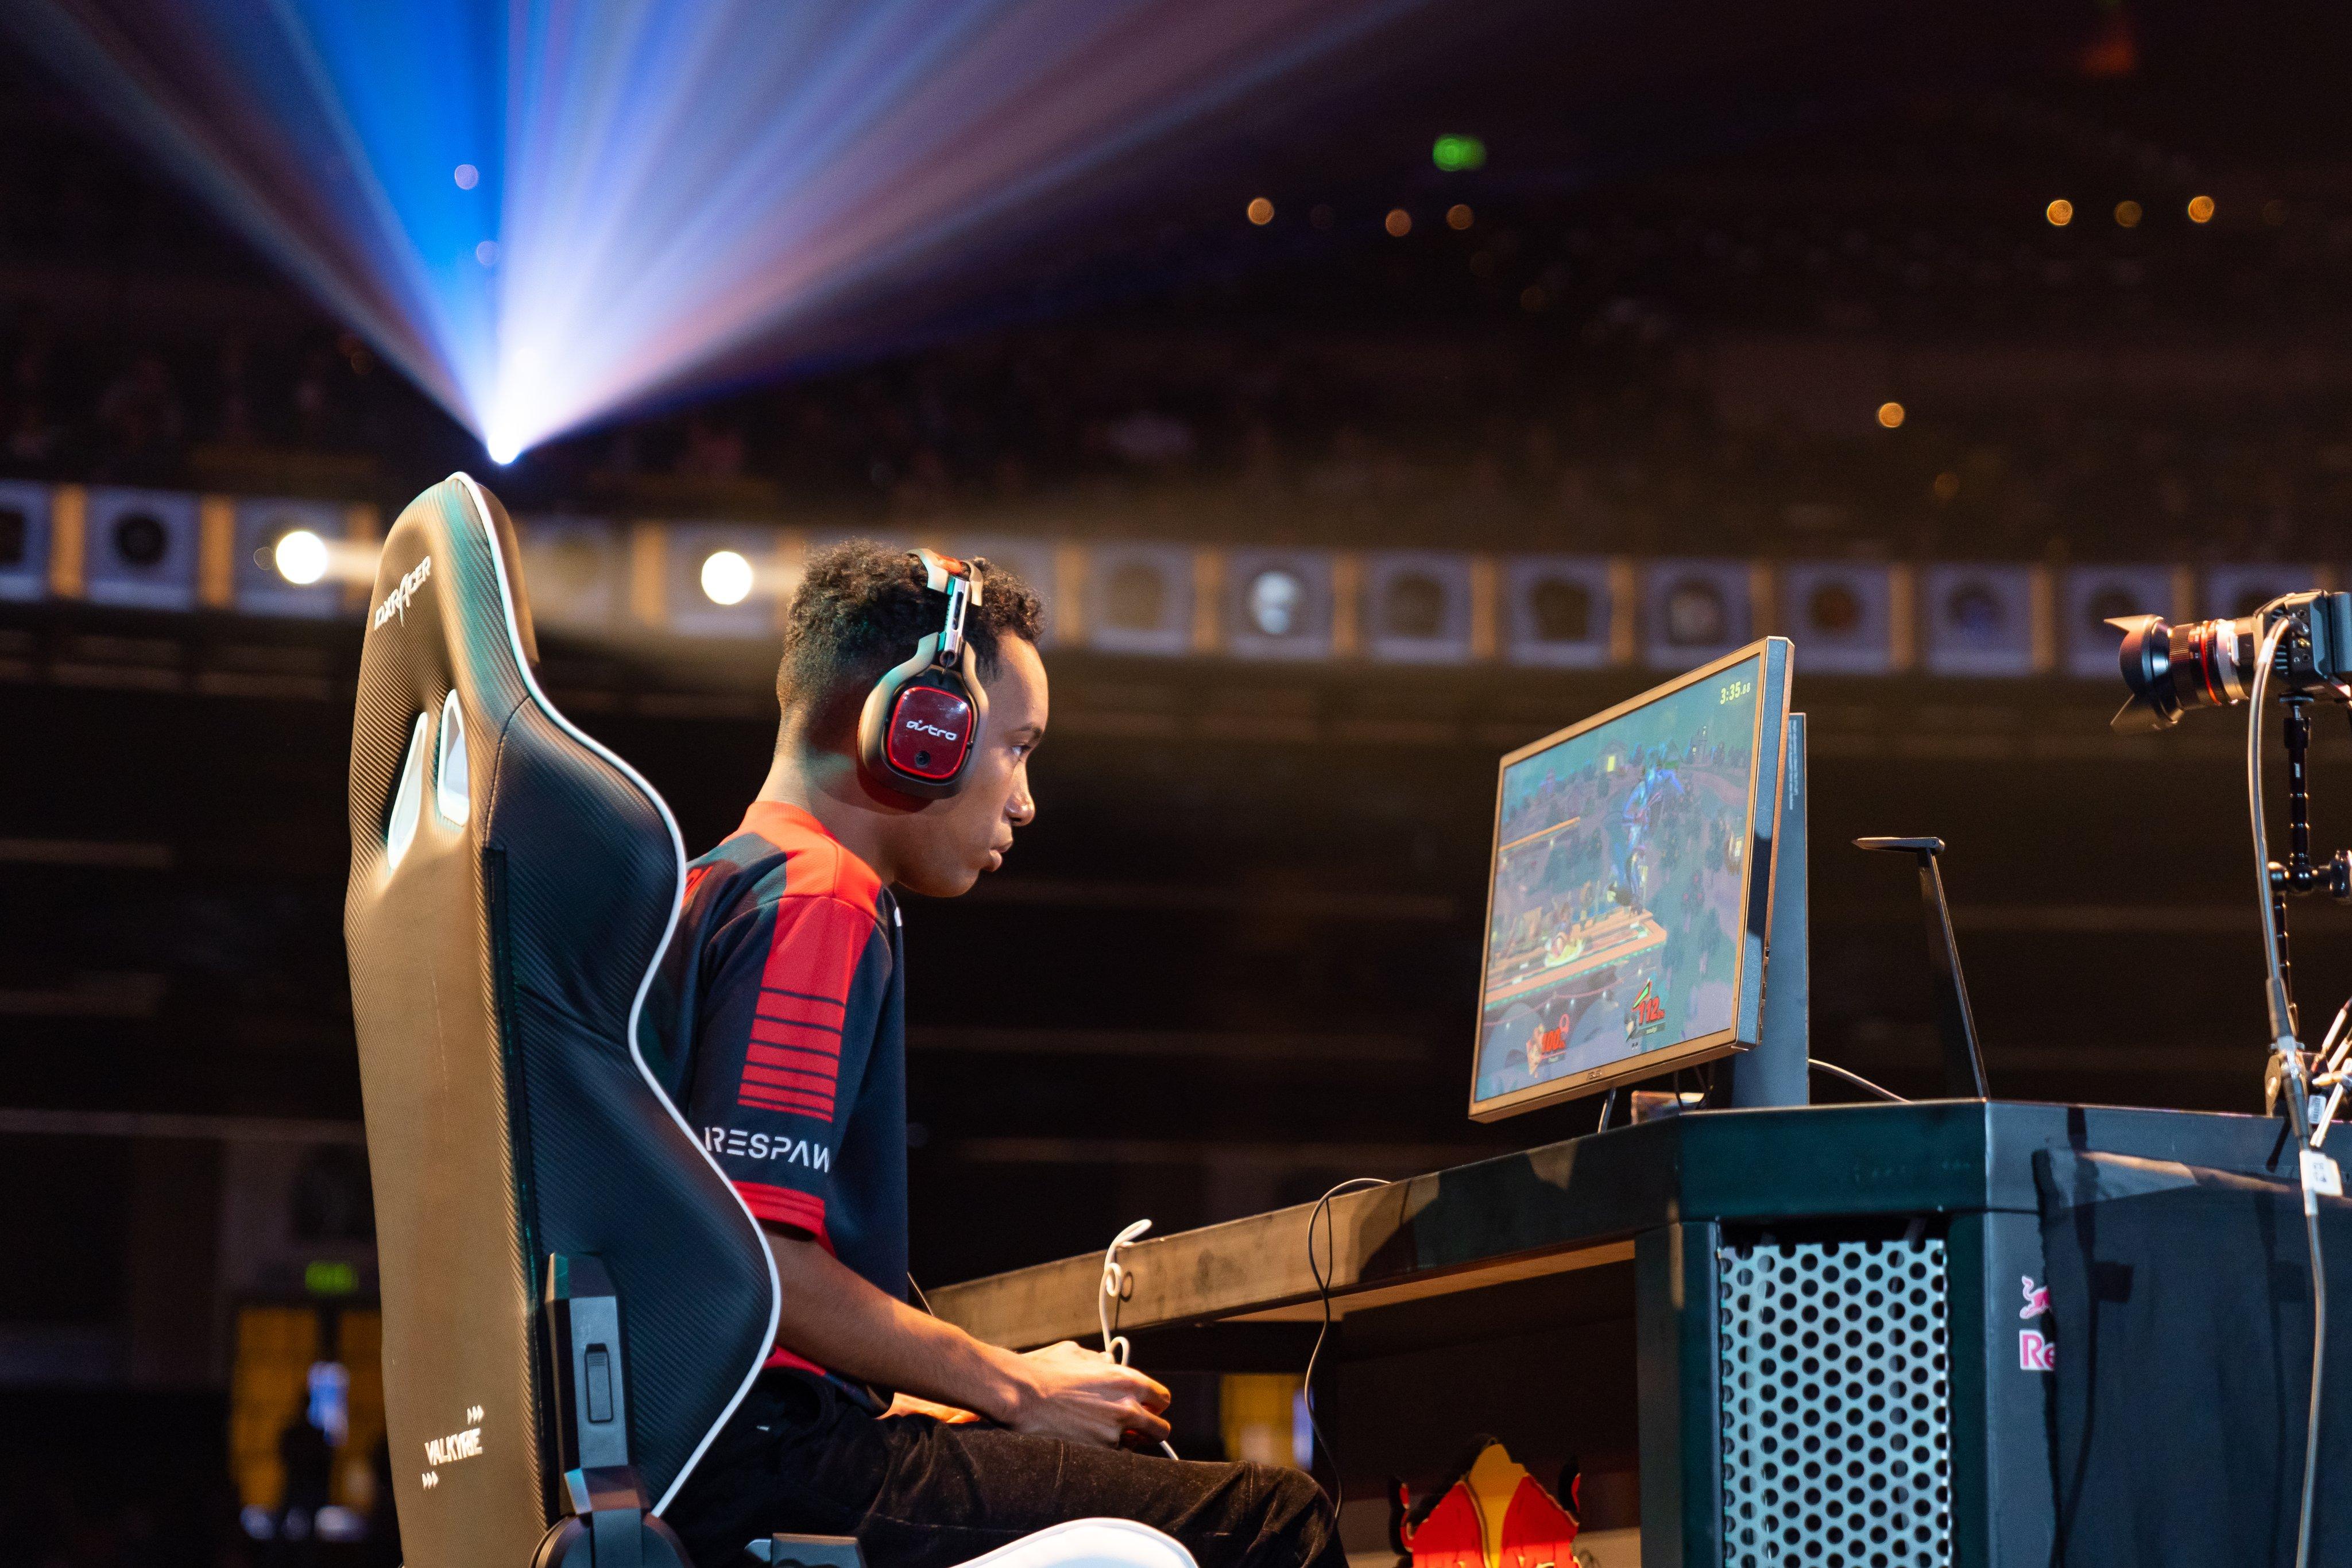 Top 5 Smash Ultimate Players: #3 Samsora